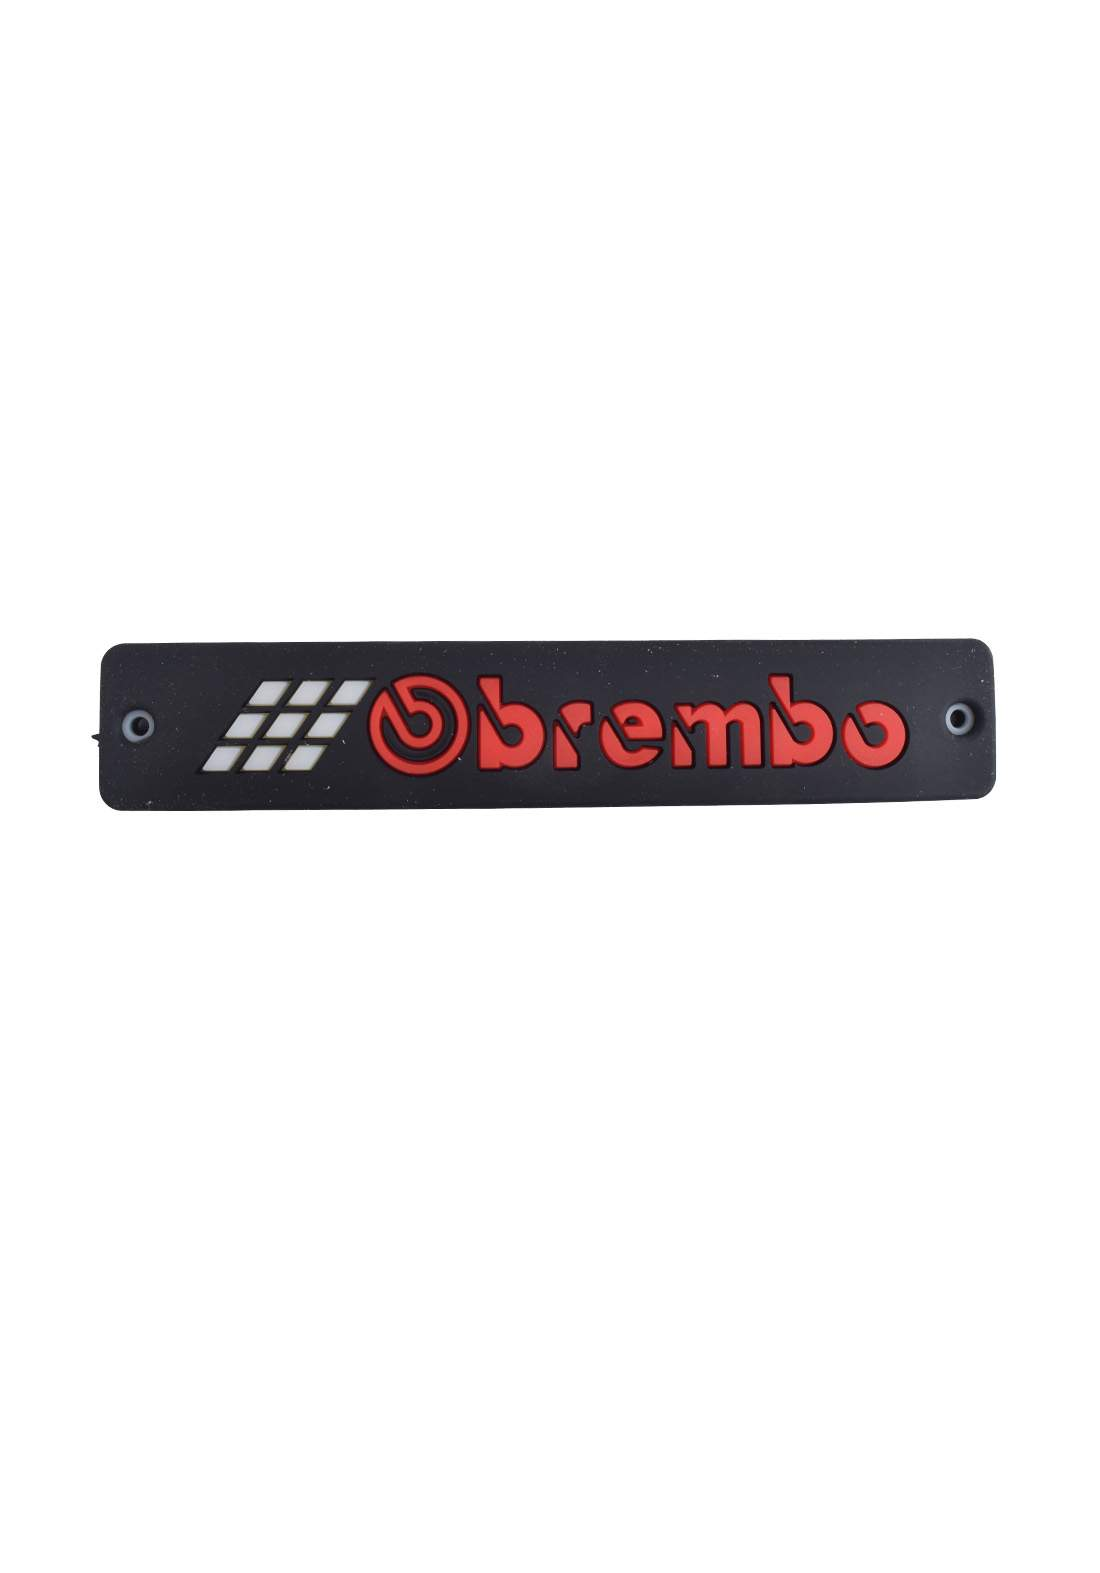 Led Daytime Running Lights -CBREMBO علامة ضوئية للسيارة